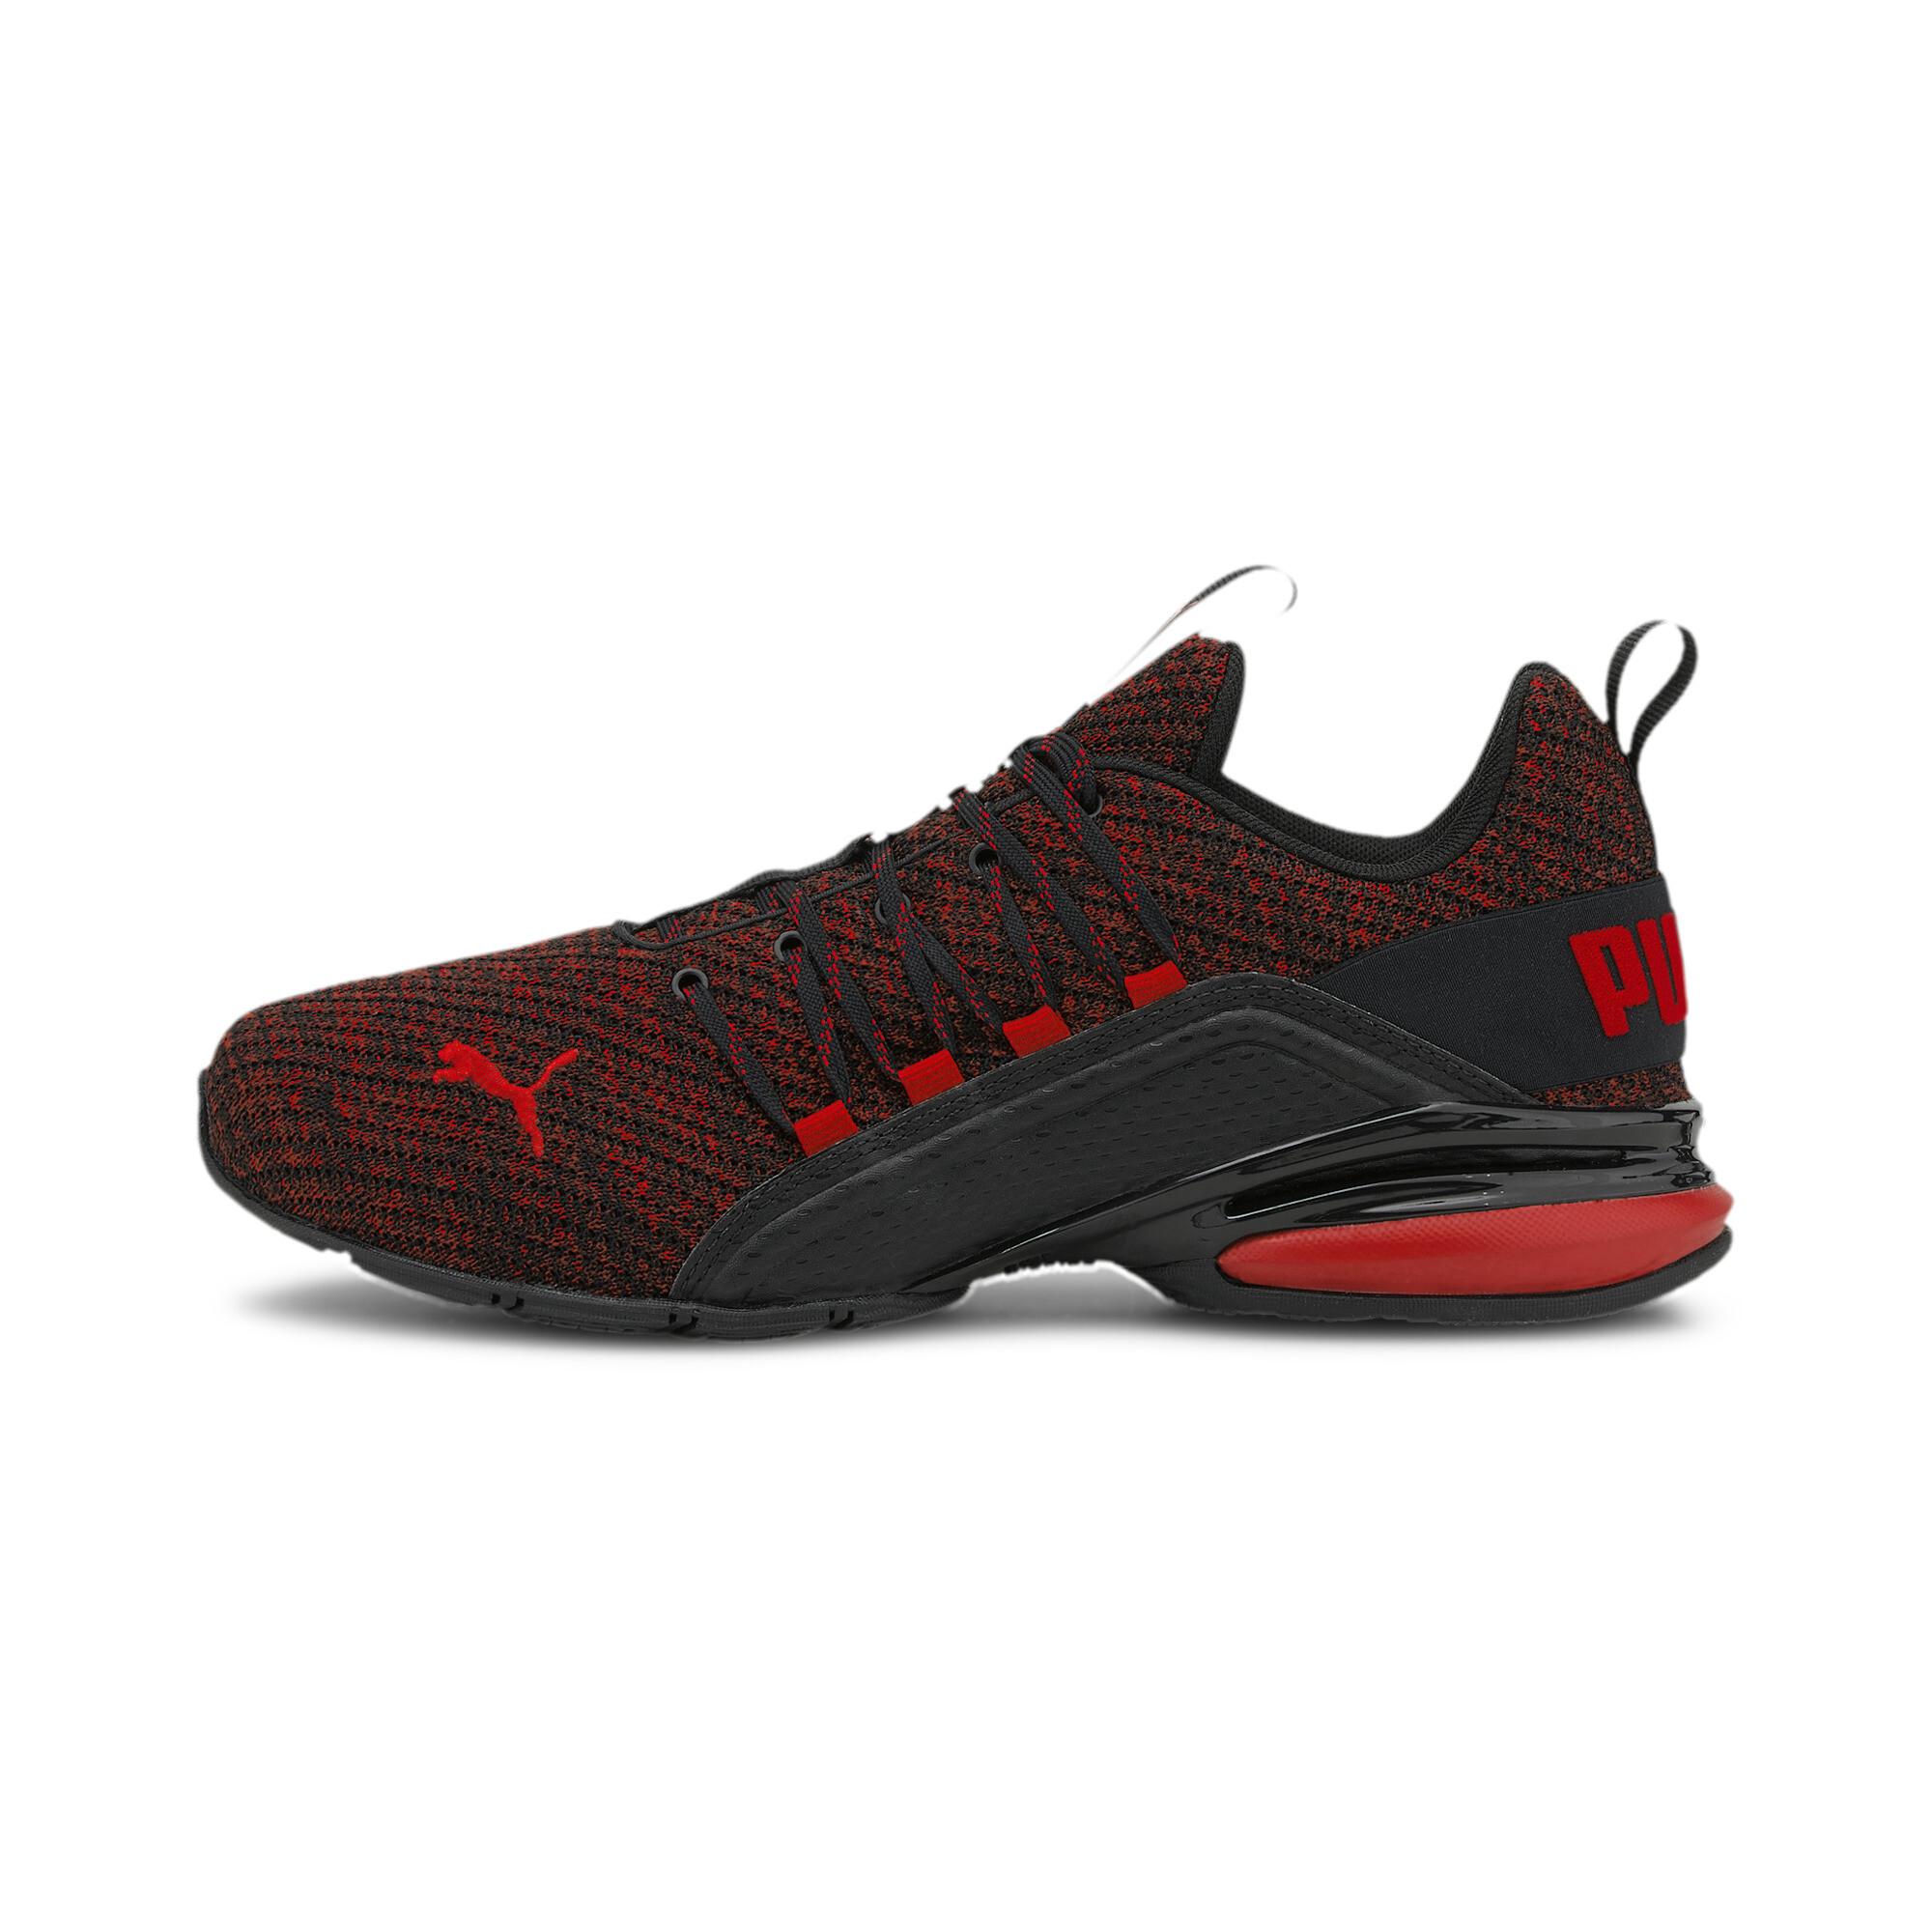 PUMA-Men-039-s-Axelion-Ultra-Running-Shoes thumbnail 4